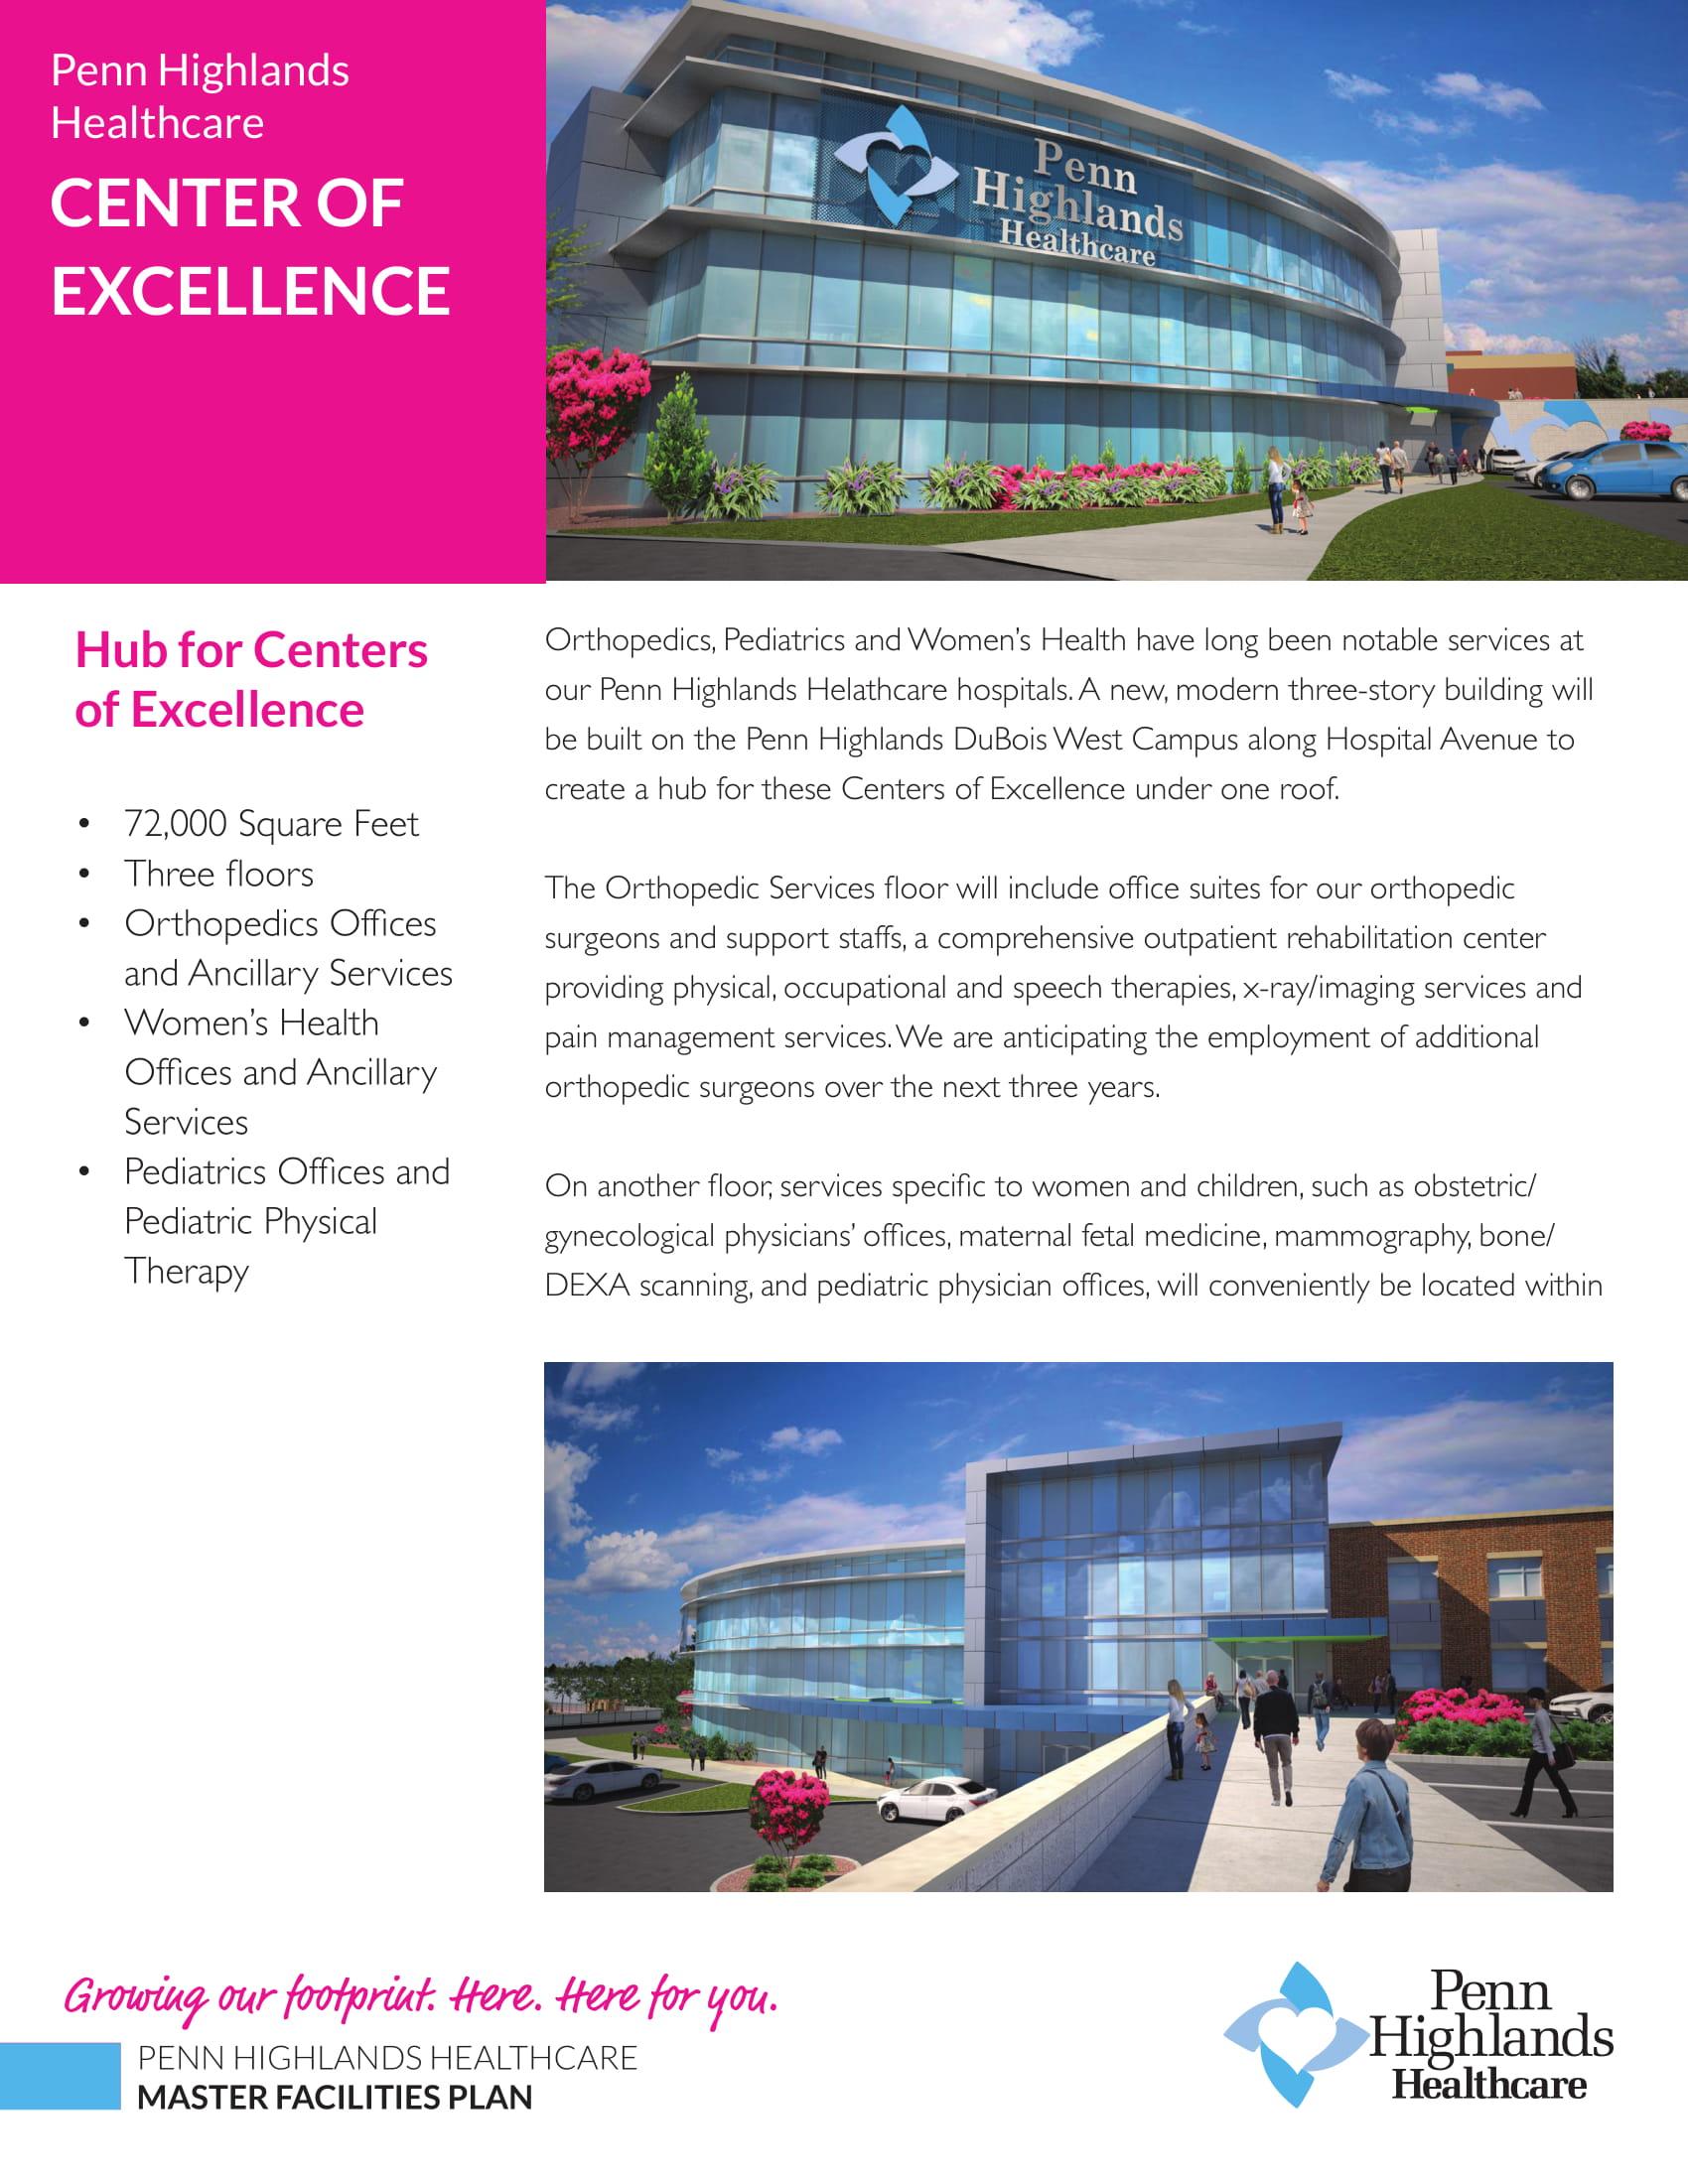 Penn Highlands unveils expansion and renovation plans